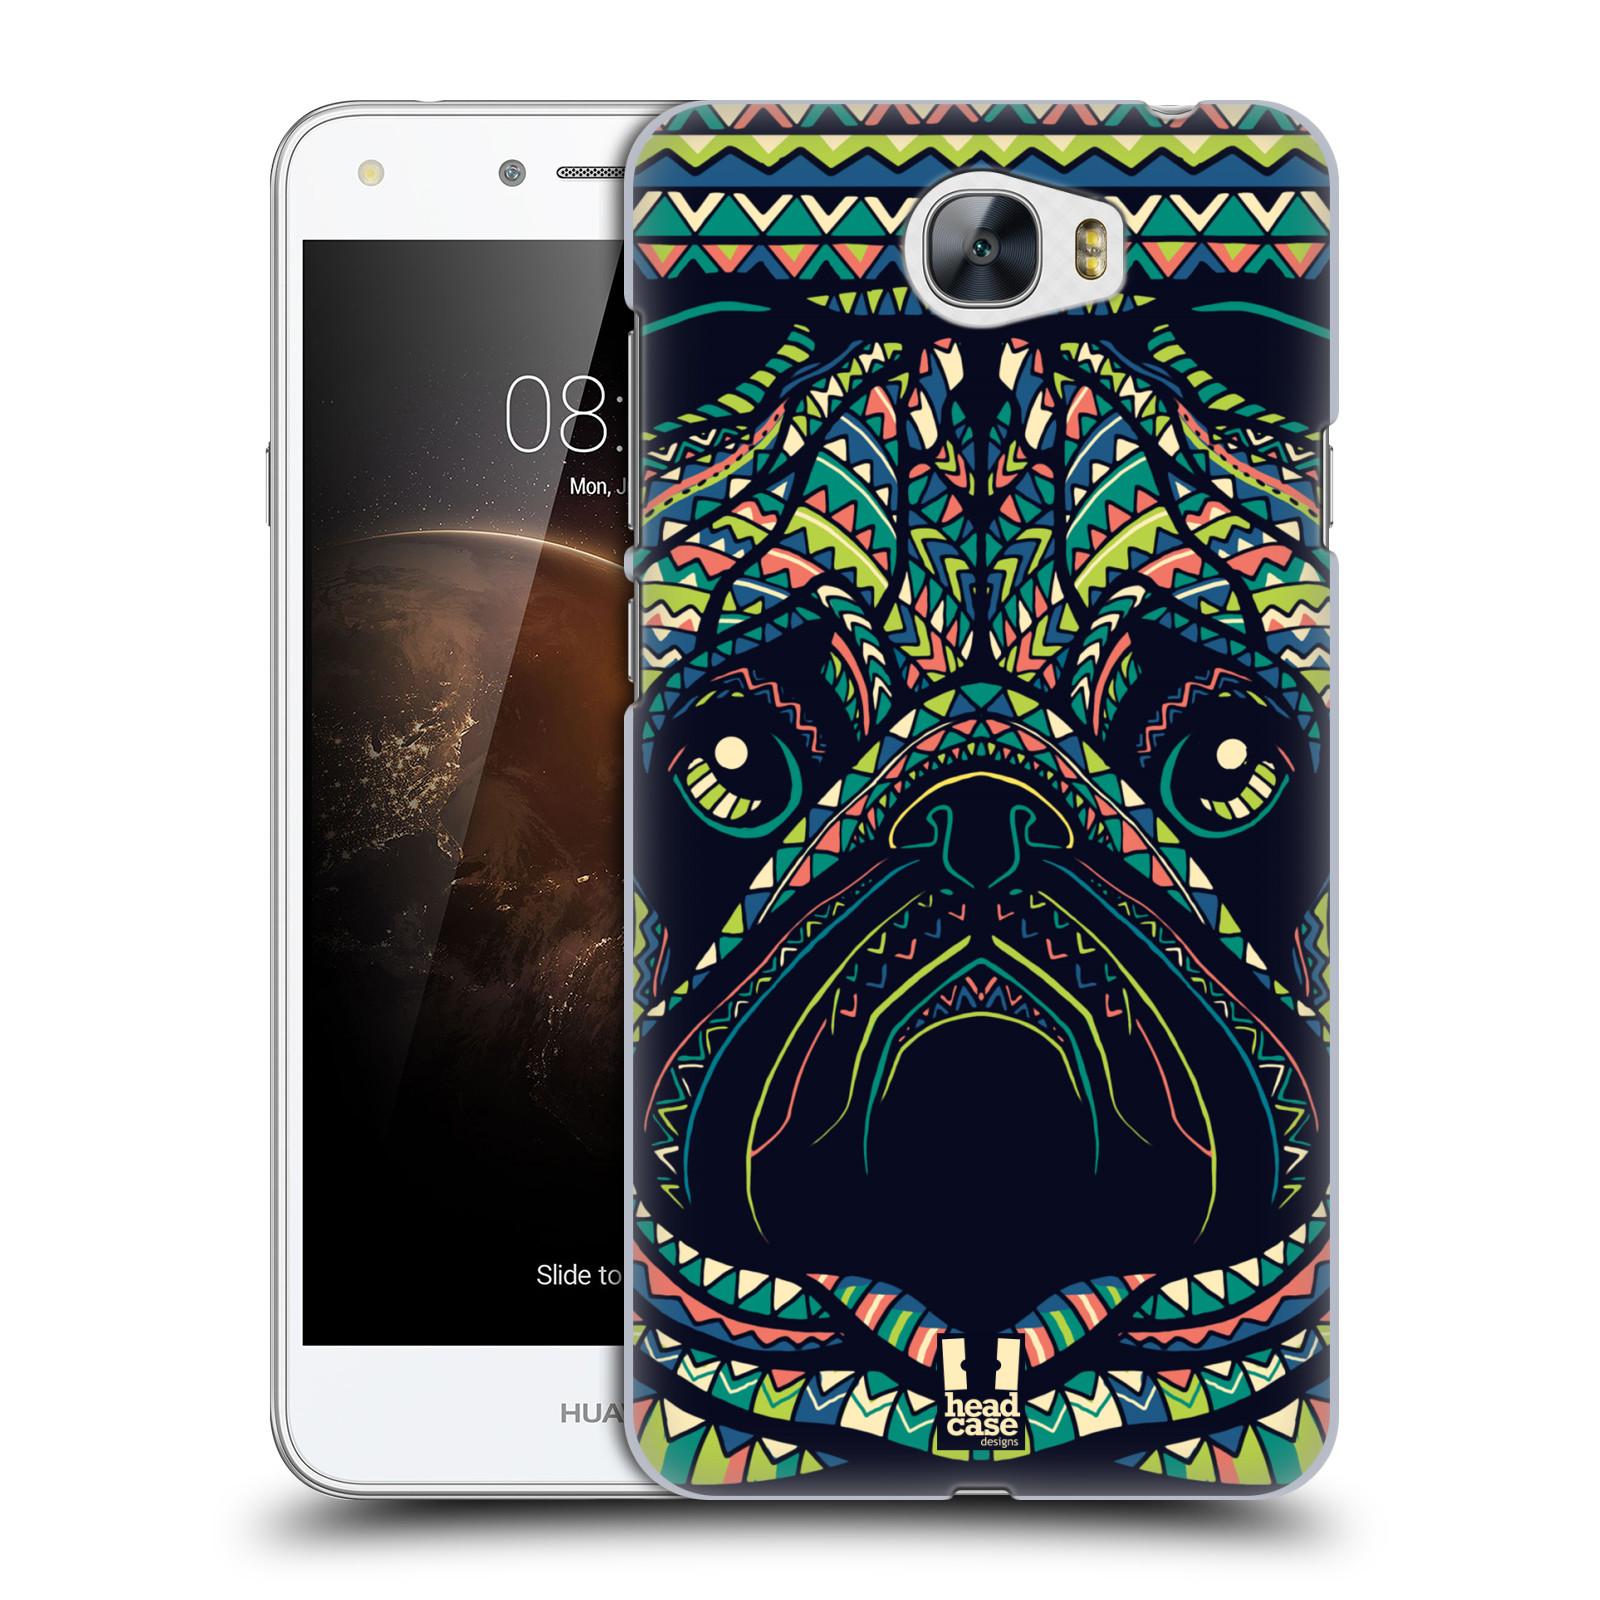 Plastové pouzdro na mobil Huawei Y5 II HEAD CASE AZTEC MOPS